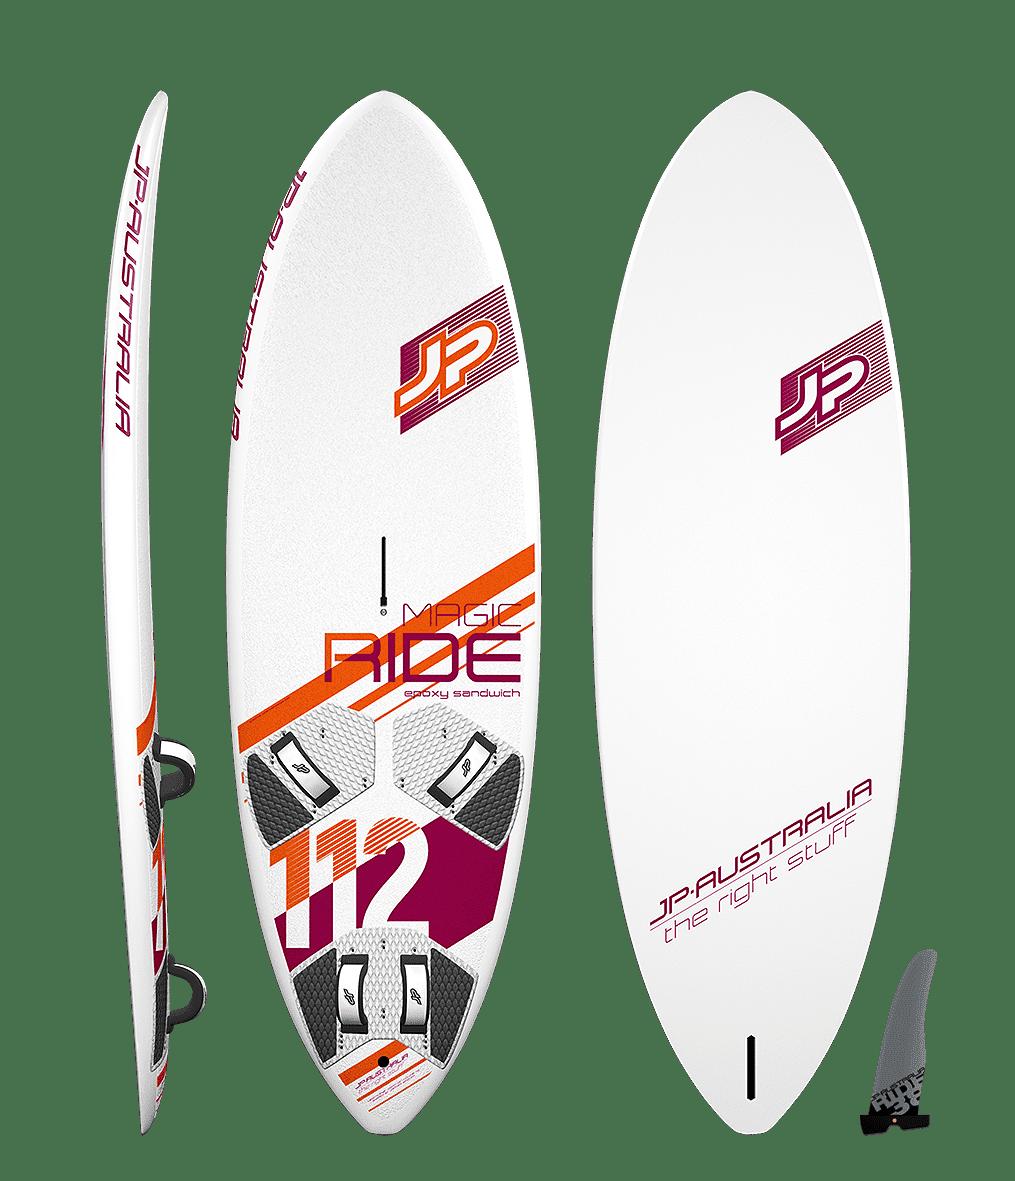 JP Australia Magic Ride ES 2019